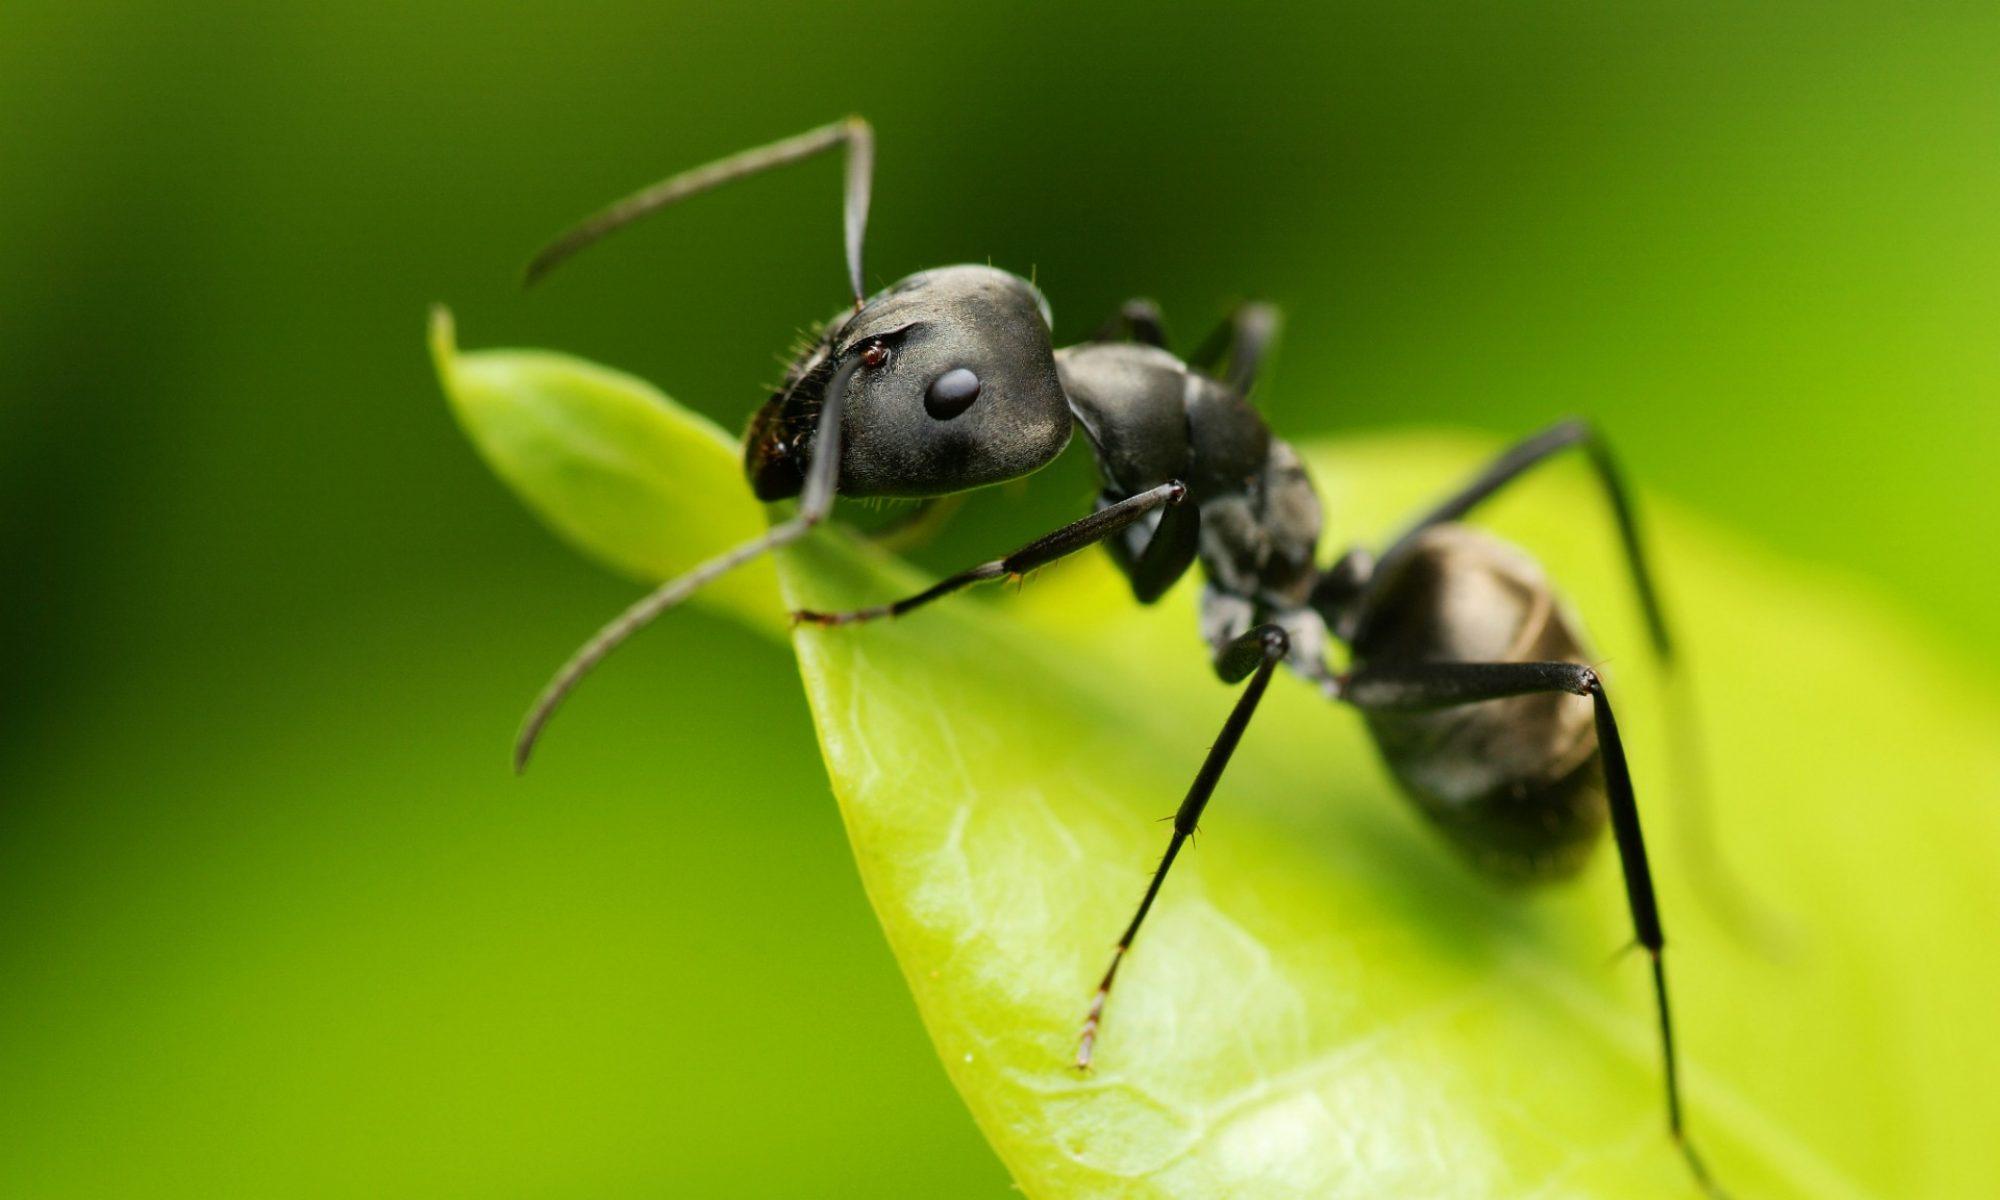 Formicarium - Boutique fourmis et vivarium fourmis